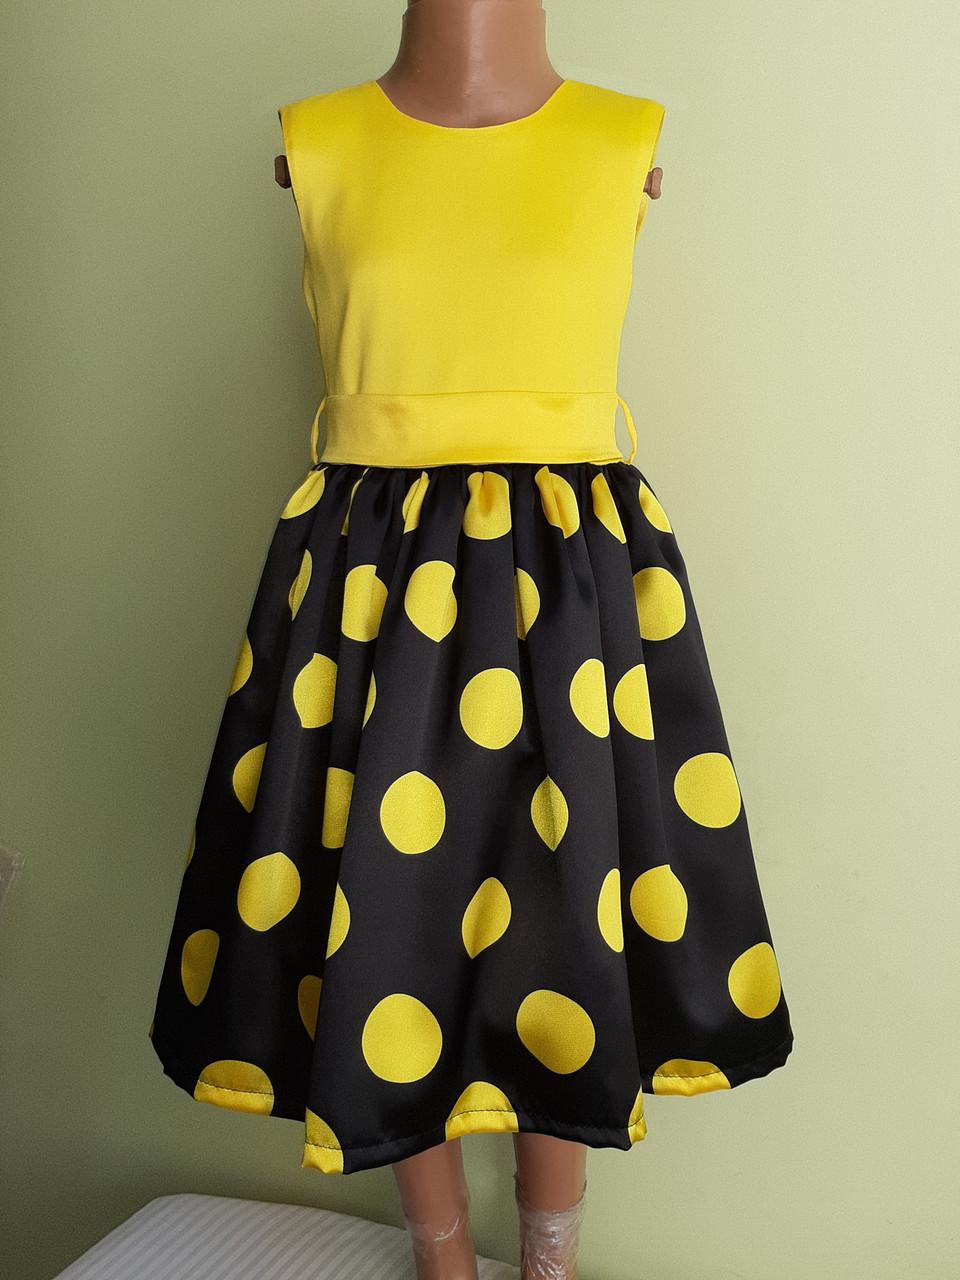 Святкова дитяча жовта сукня з бантом